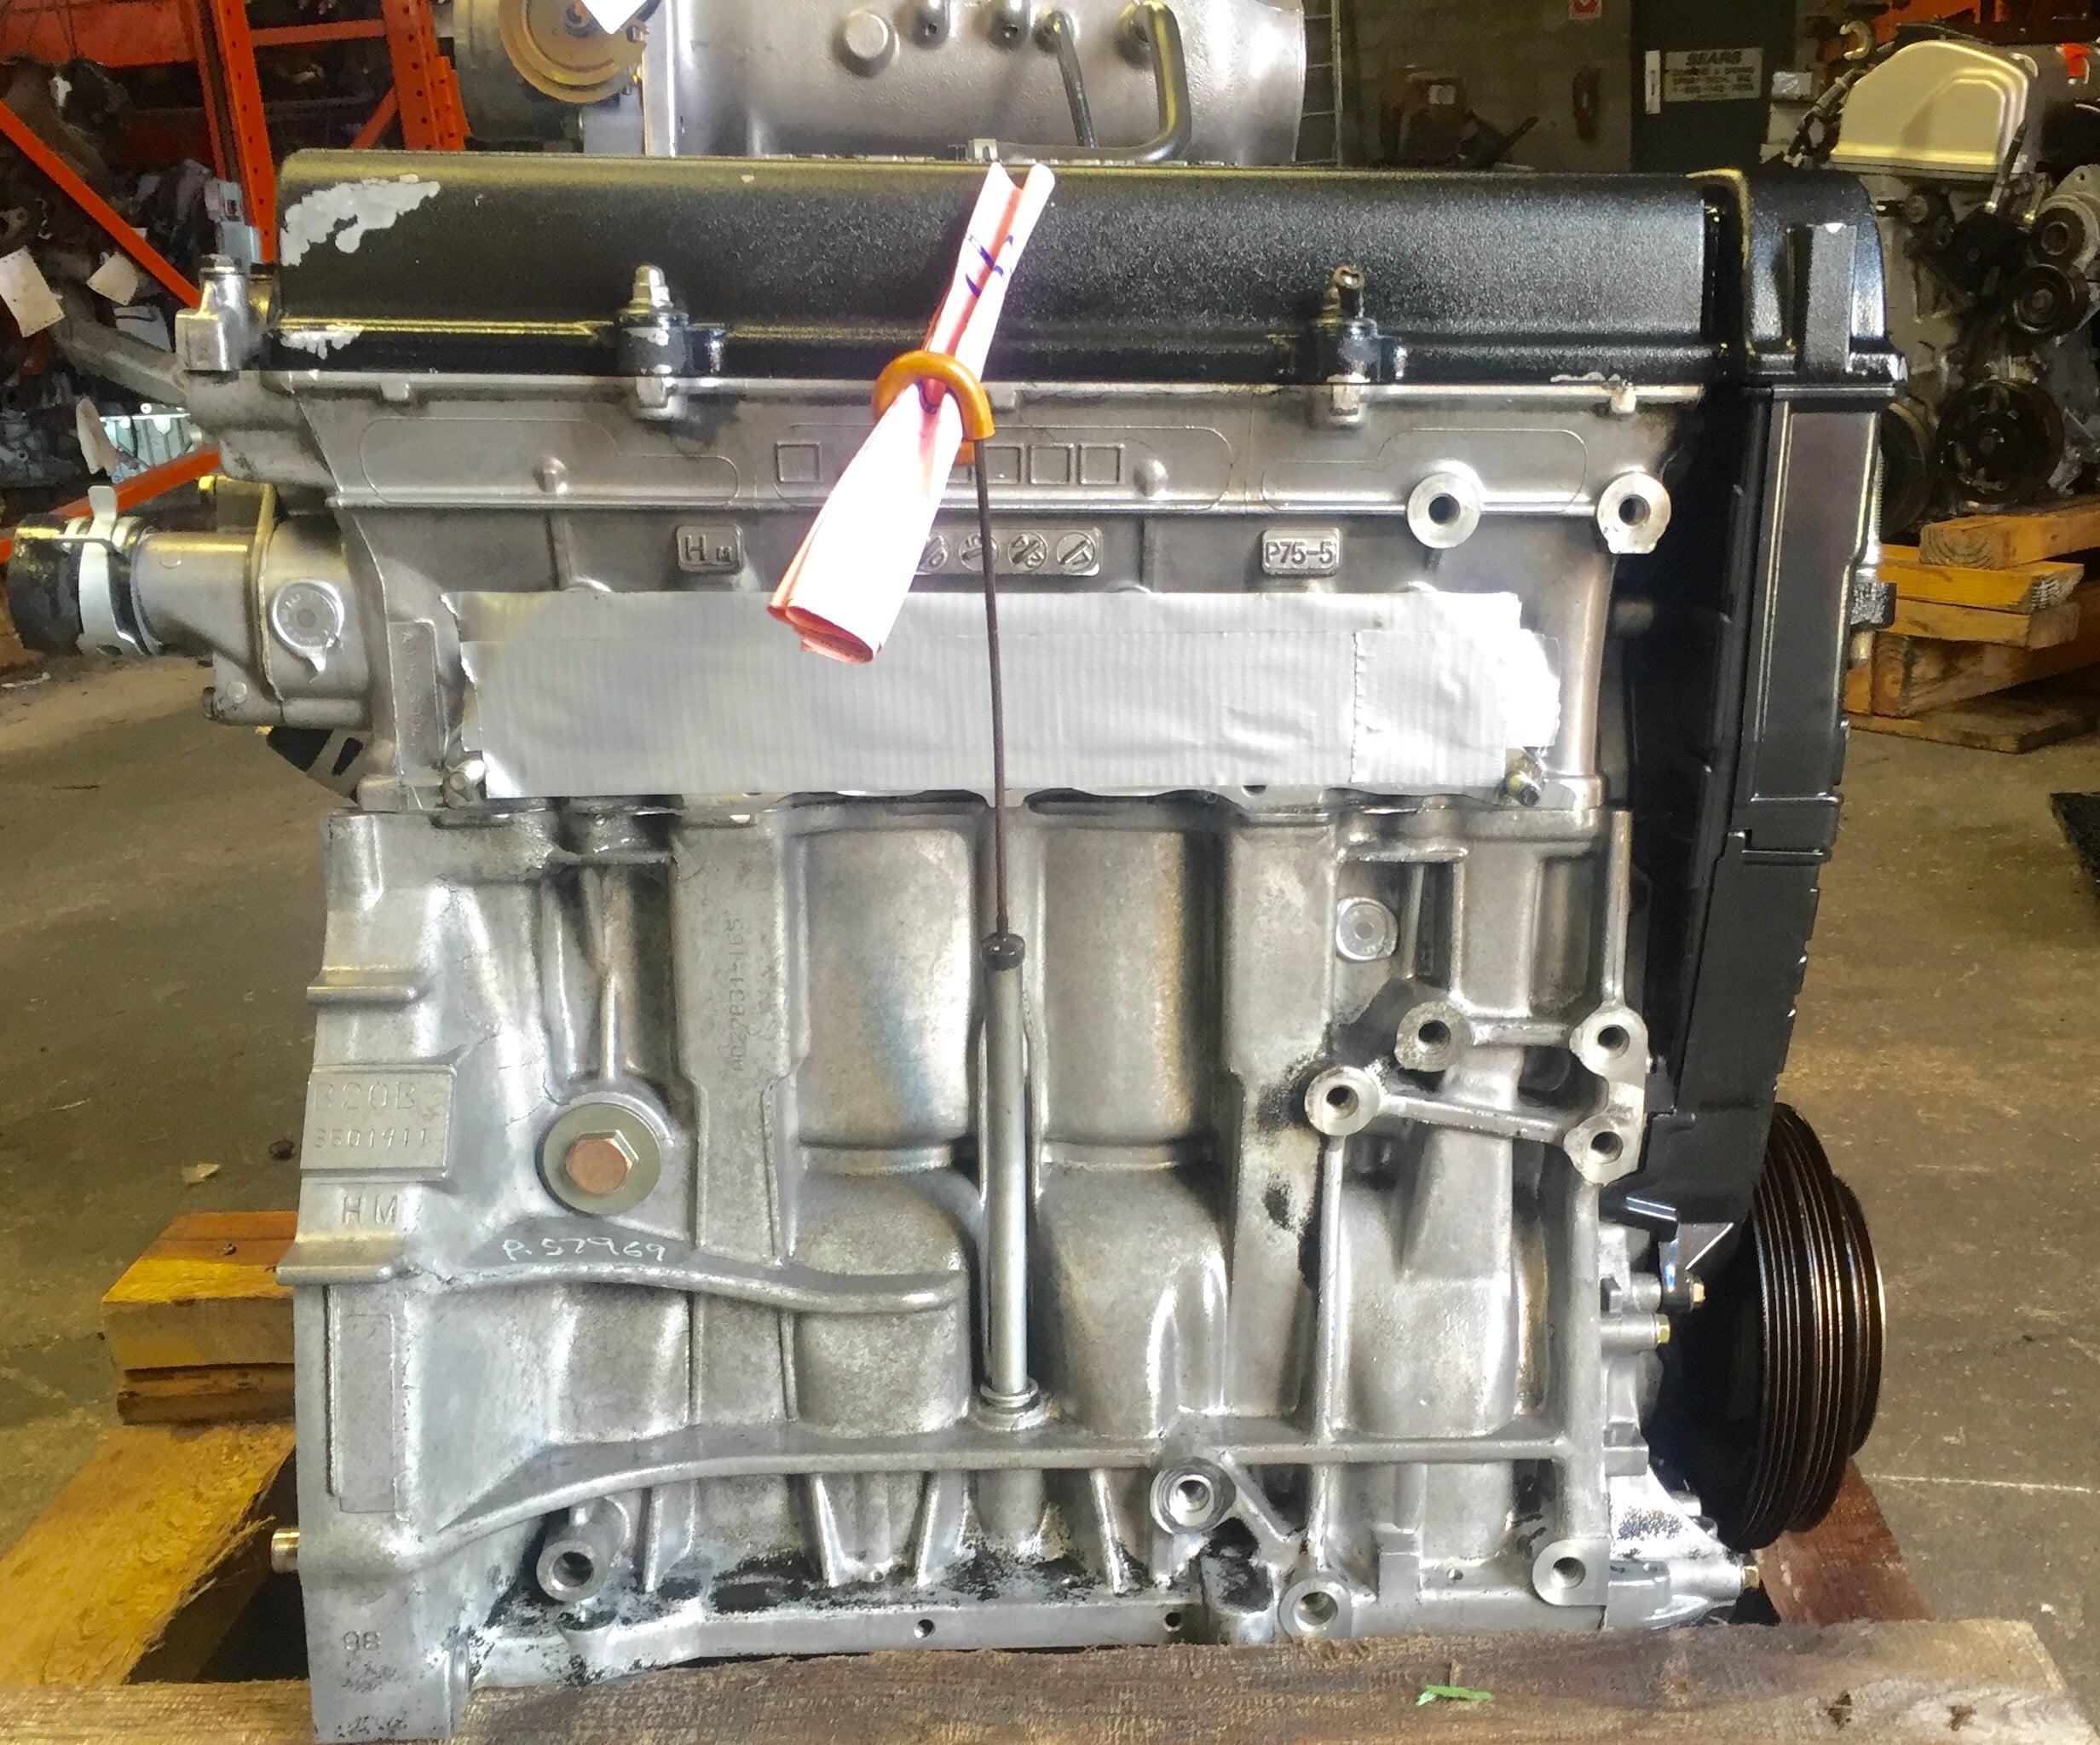 Honda crv engine 1997 2001 a a auto truck llc for Honda crv engine size